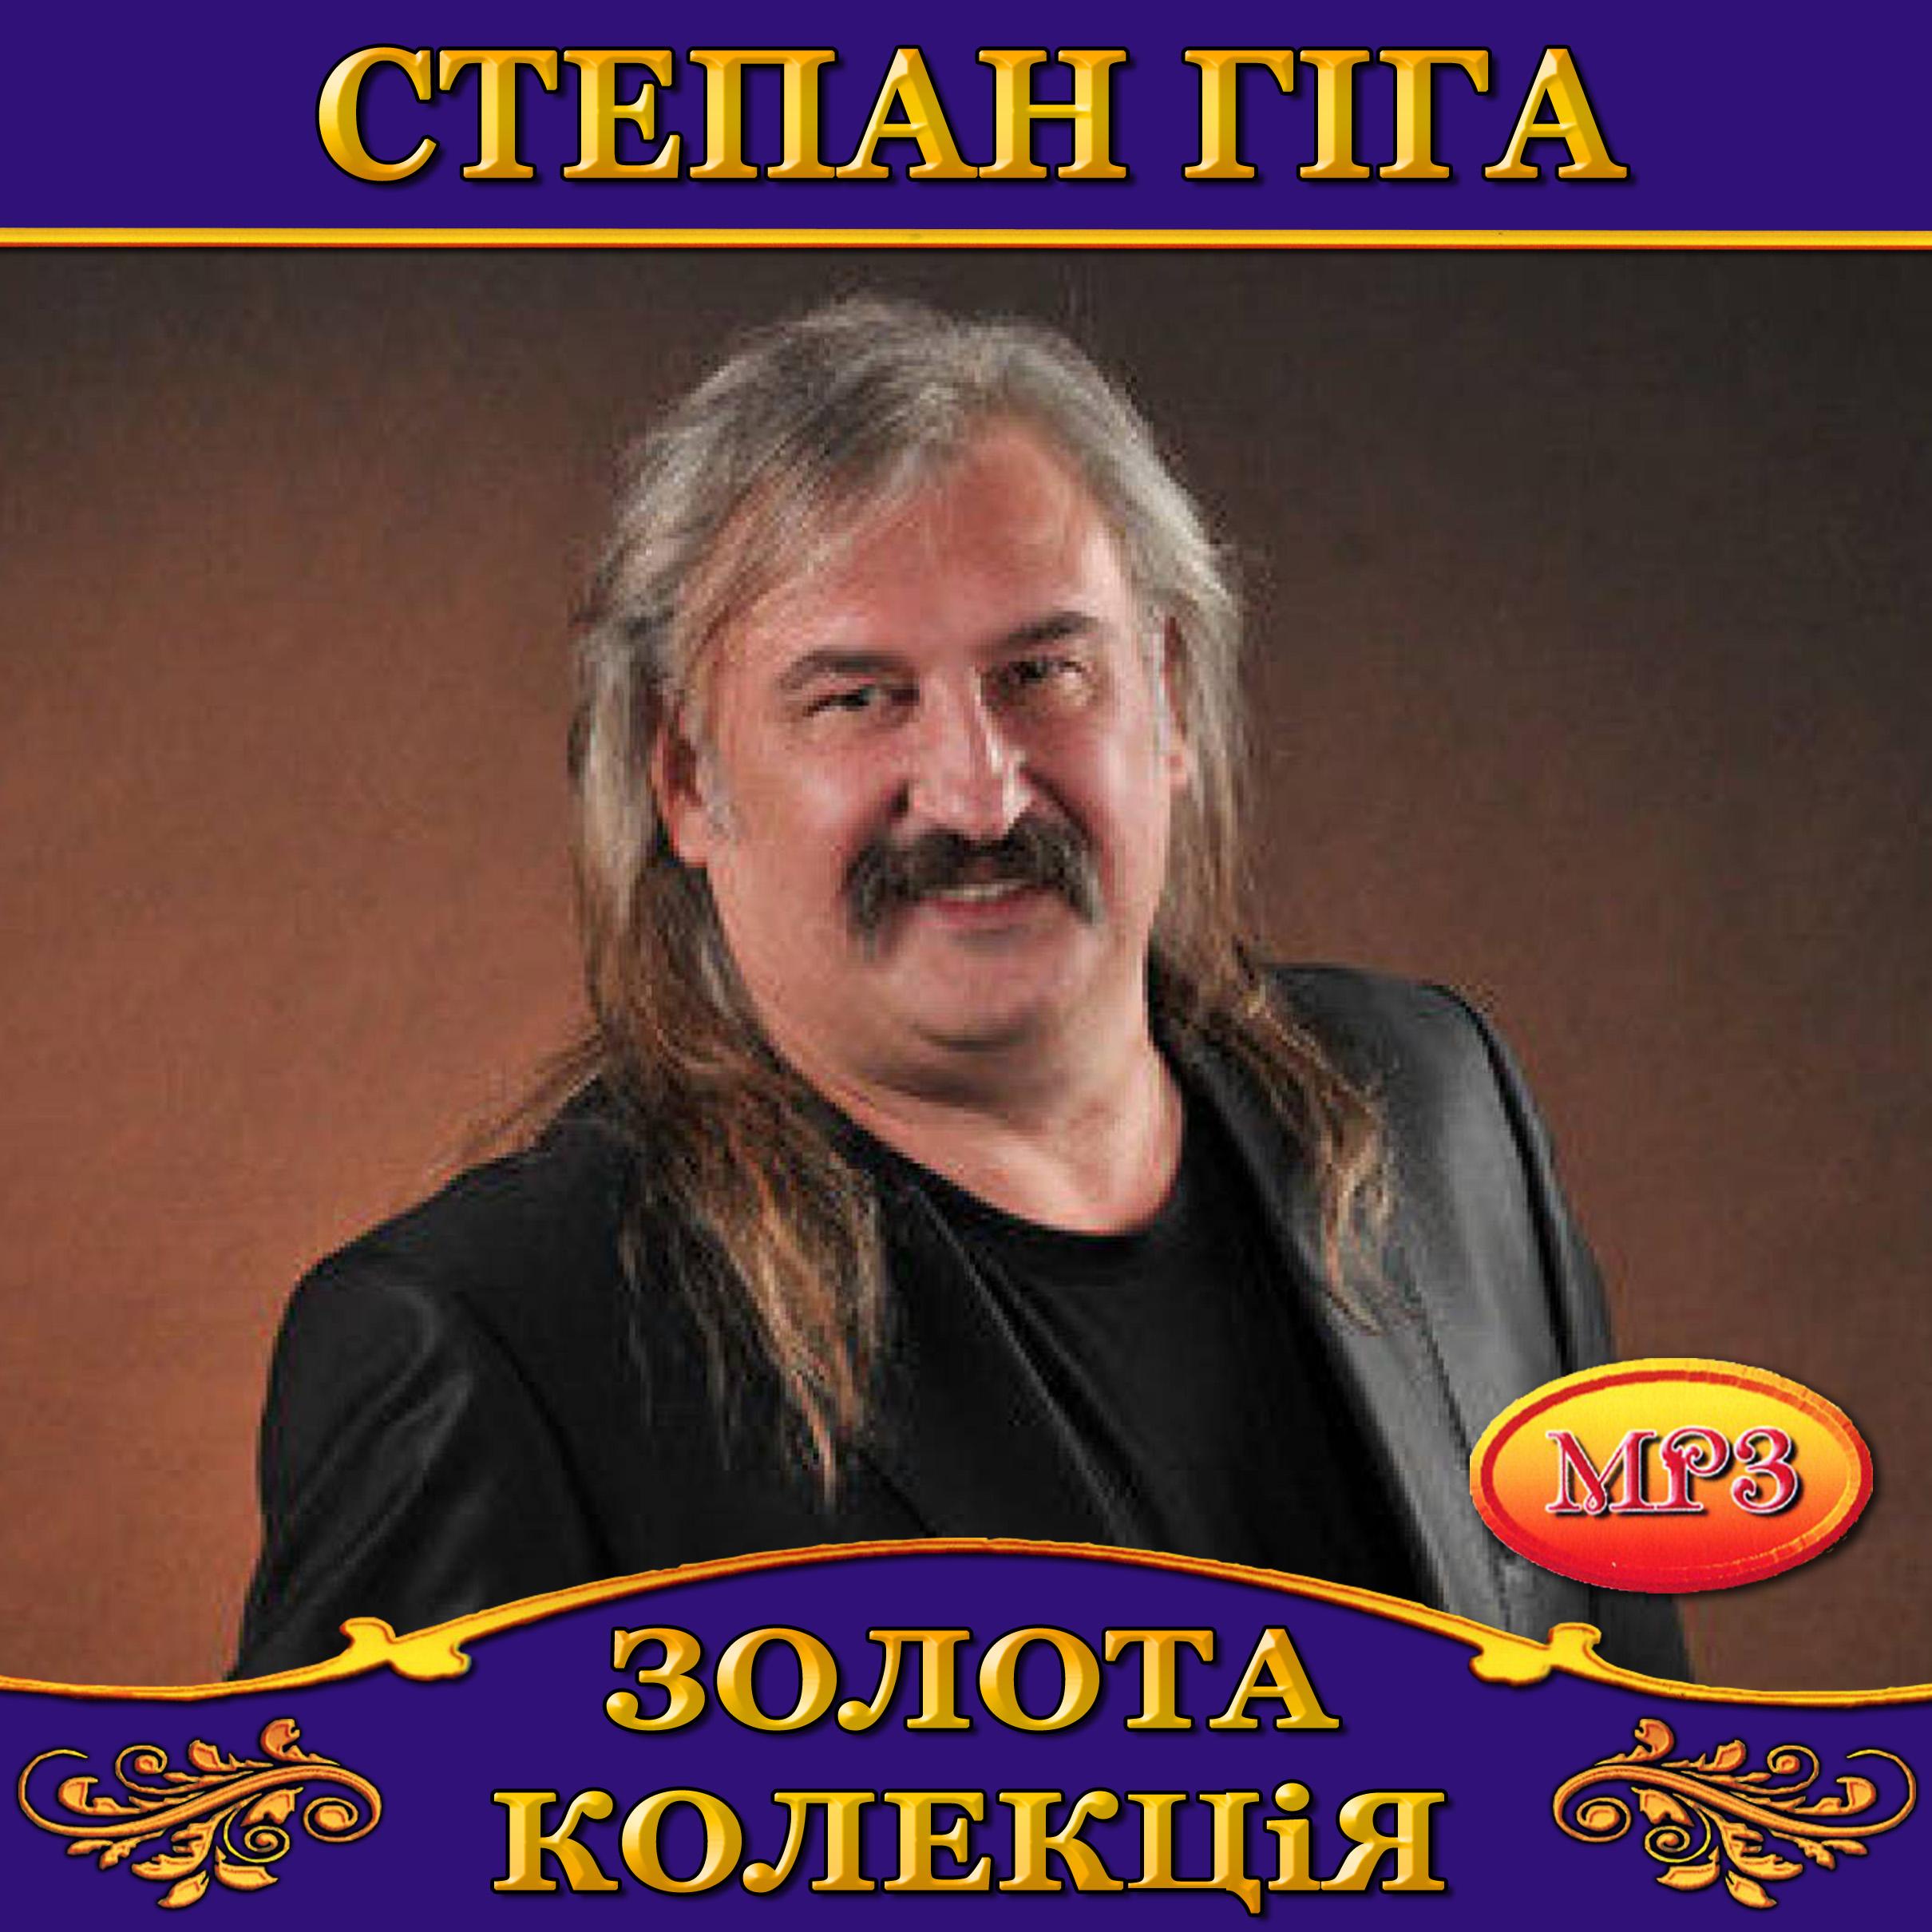 Степан Гіга [mp3]